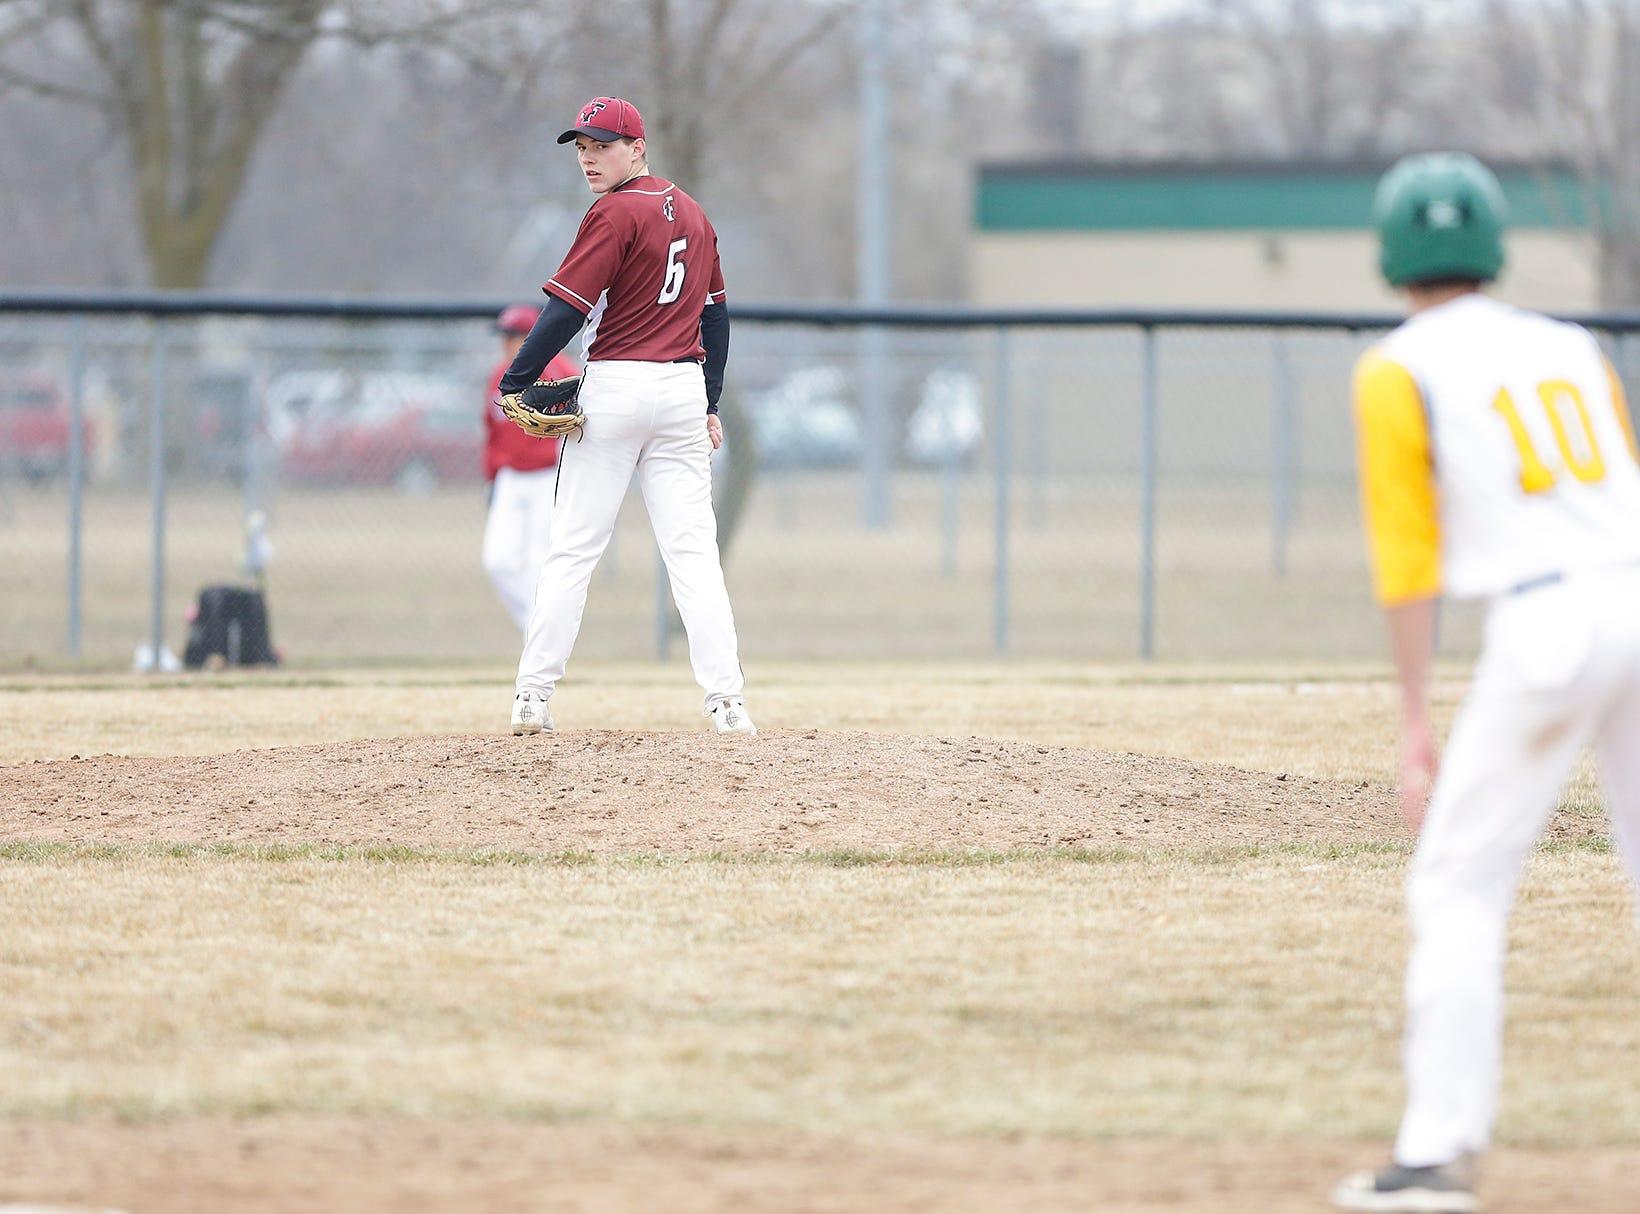 Fond du Lac High School baseball's Fletcher Haus checks on Ashwaubenon High School's Luke Hansford at first base Saturday, April 6, 2019 during their game in Fond du Lac, Wis. Fond du Lac won the game 5-3. Doug Raflik/USA TODAY NETWORK-Wisconsin